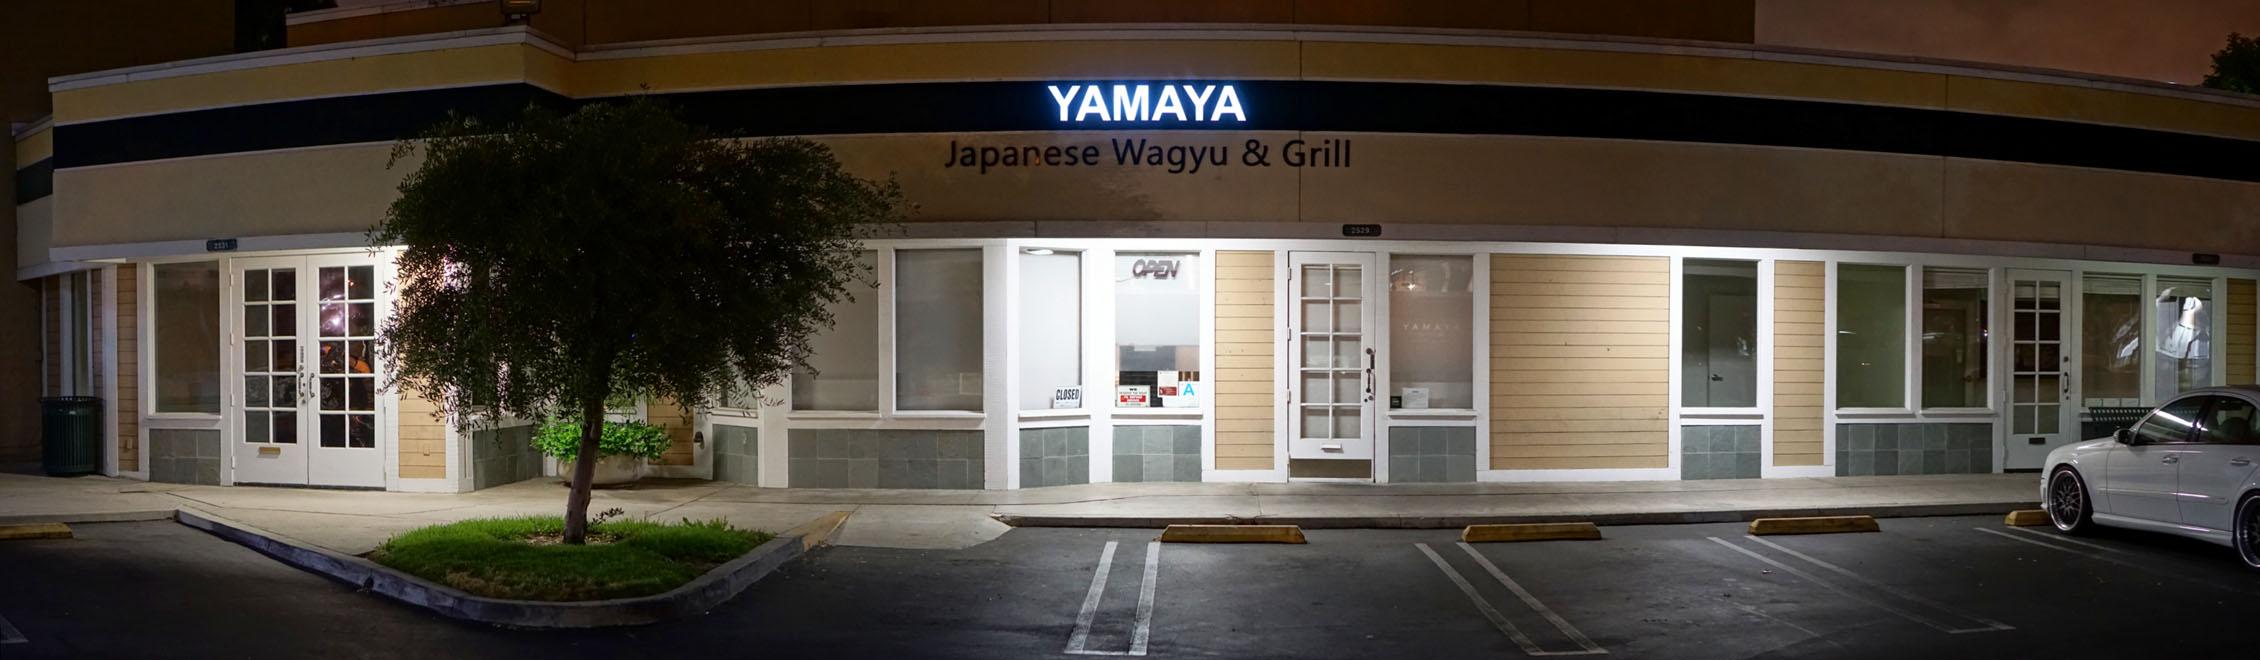 Yamaya Japanese Wagyu & Grill Exterior